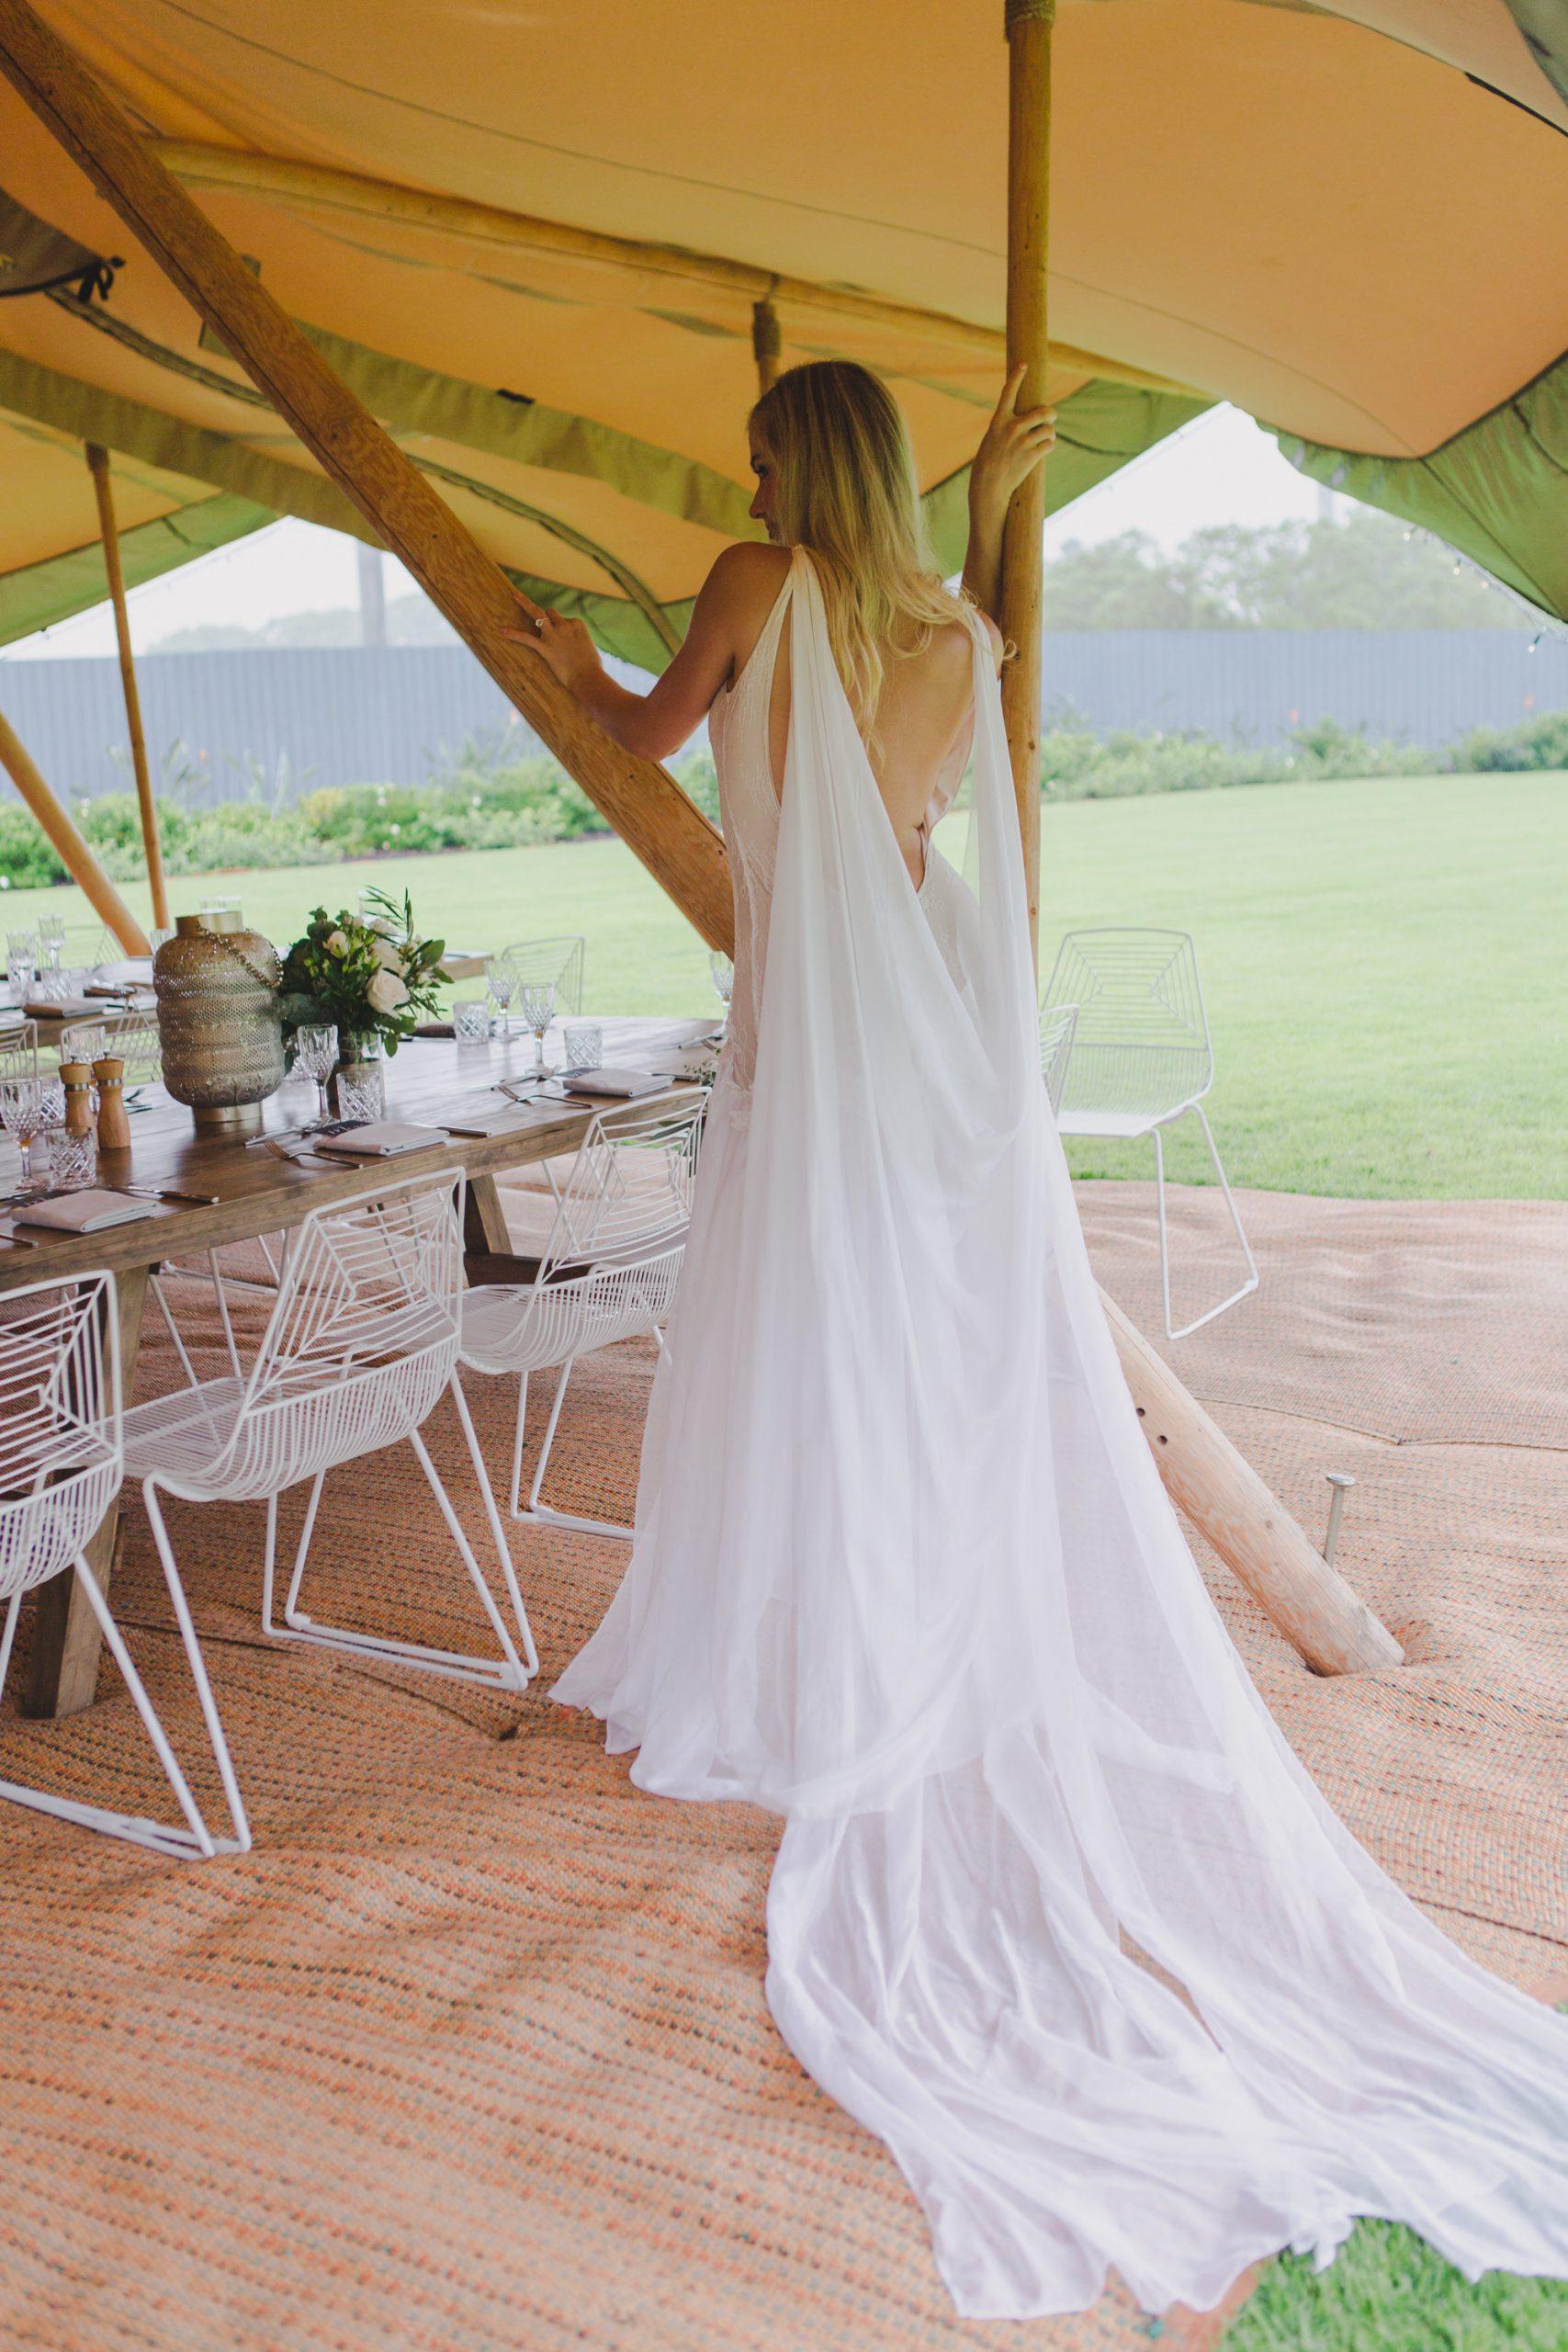 gold coast bridal wear, boho wedding dresses, gold coast wedding dresses, bohemian wedding dress, gold coast tipis, Begitta